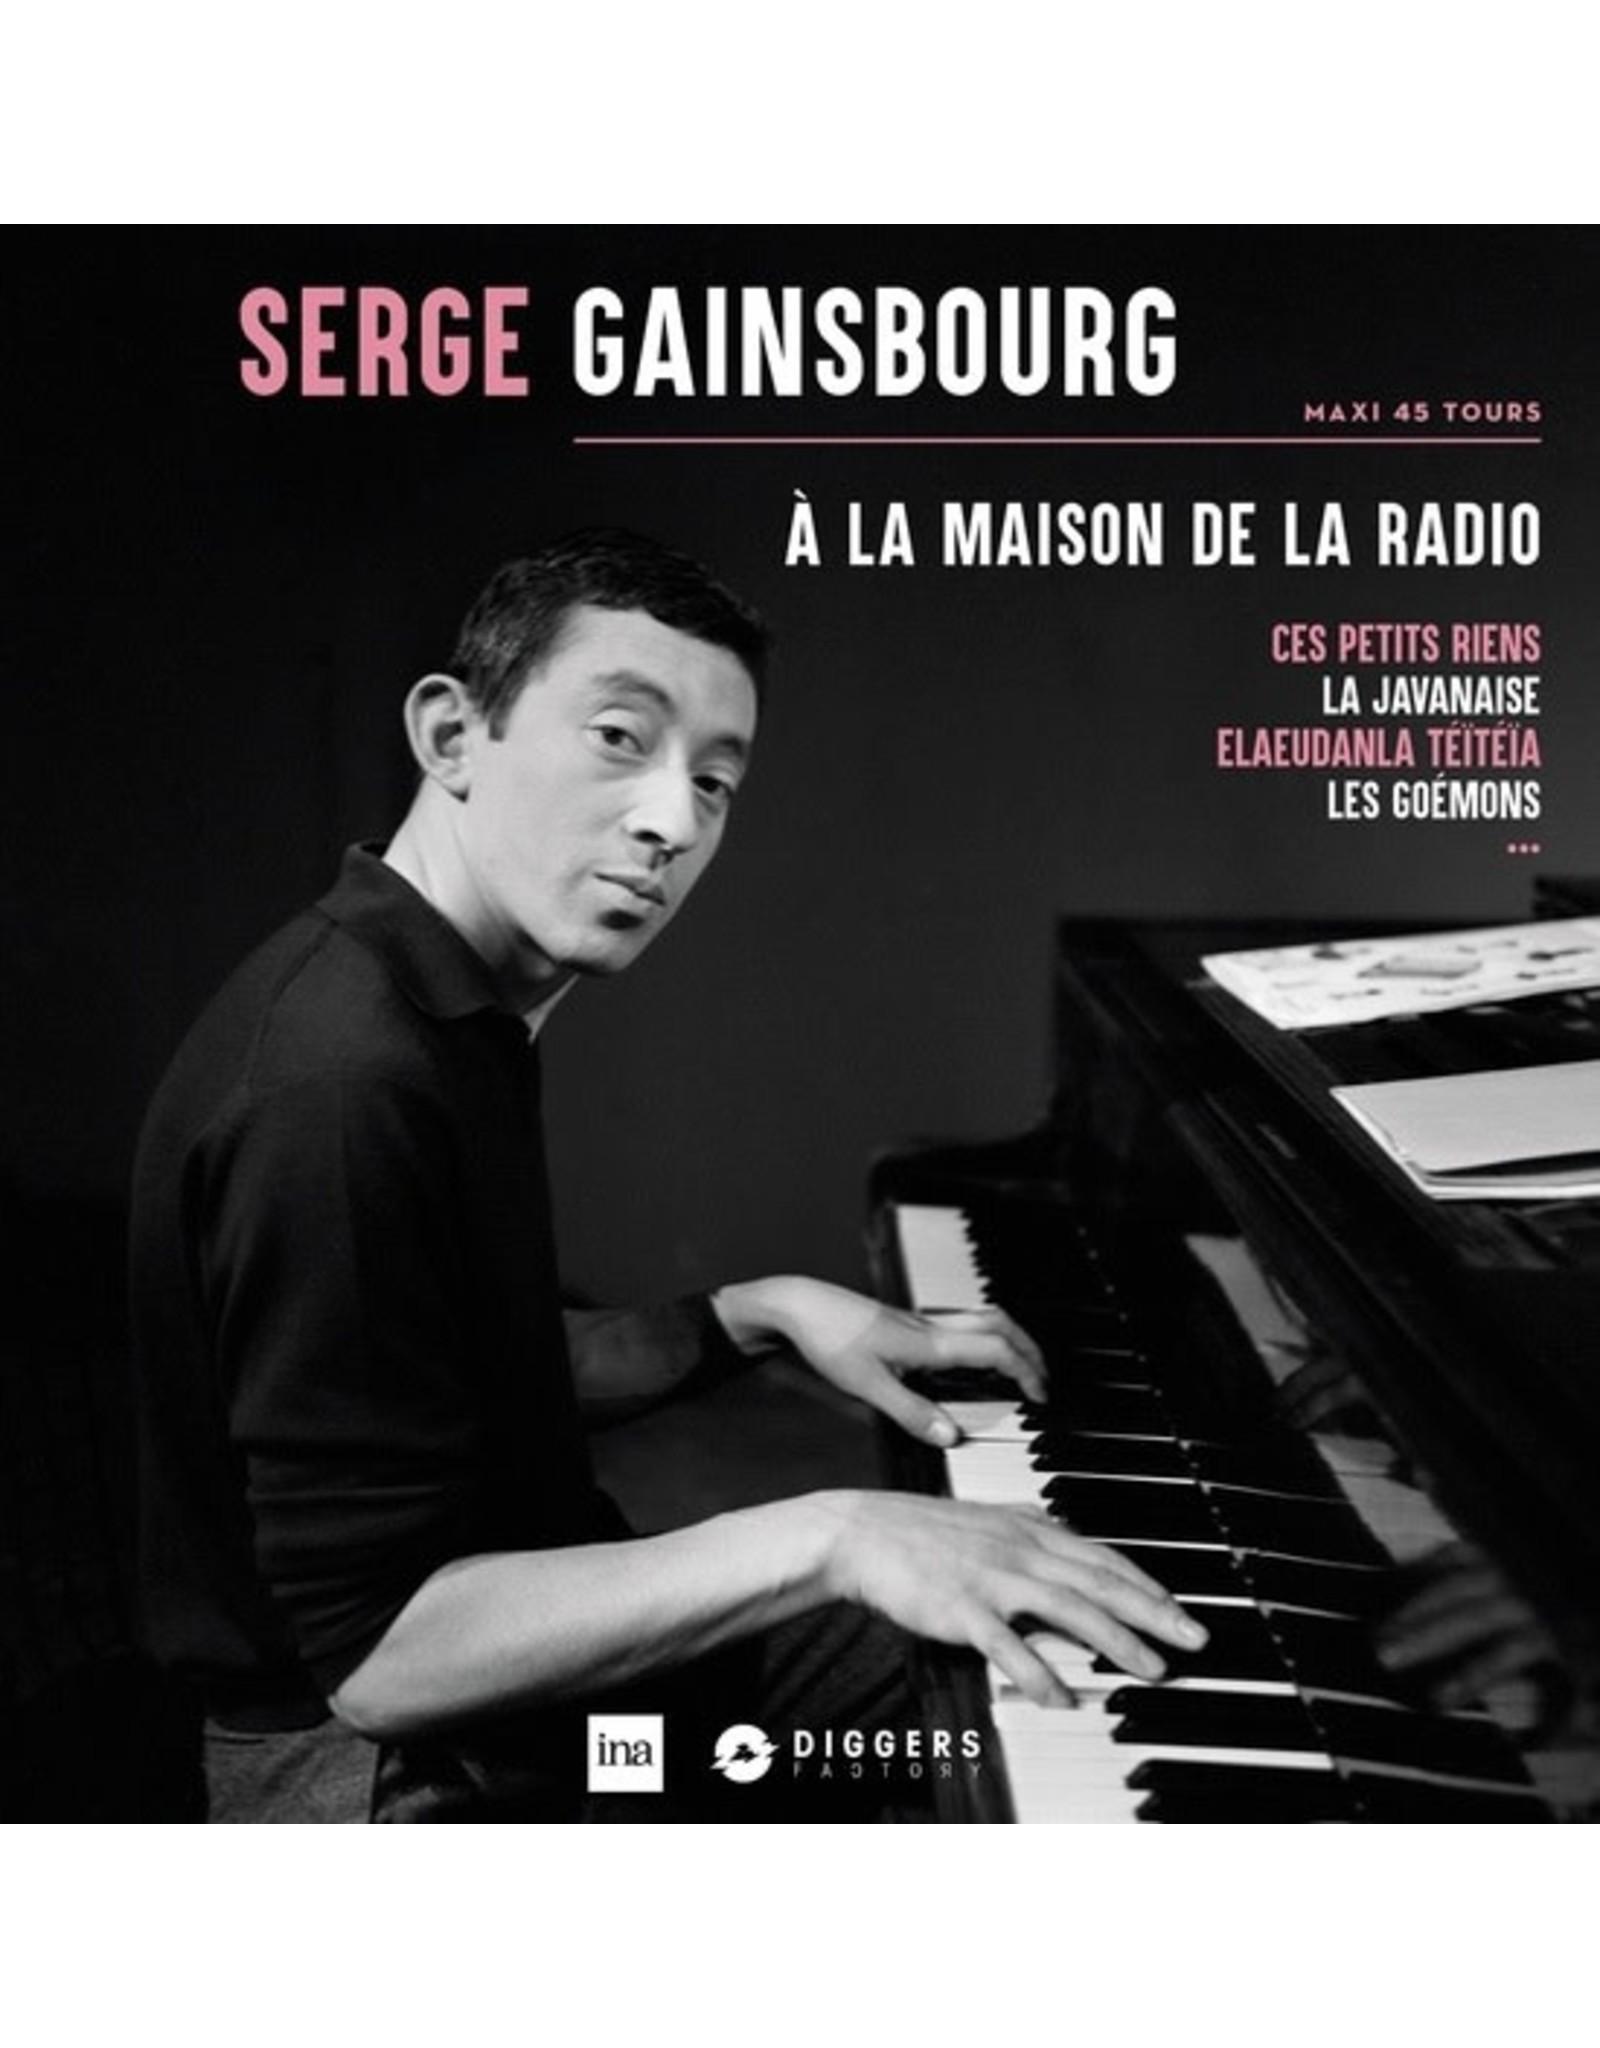 Ina Gainsbourg, Serge: Ces Petits Riens LP